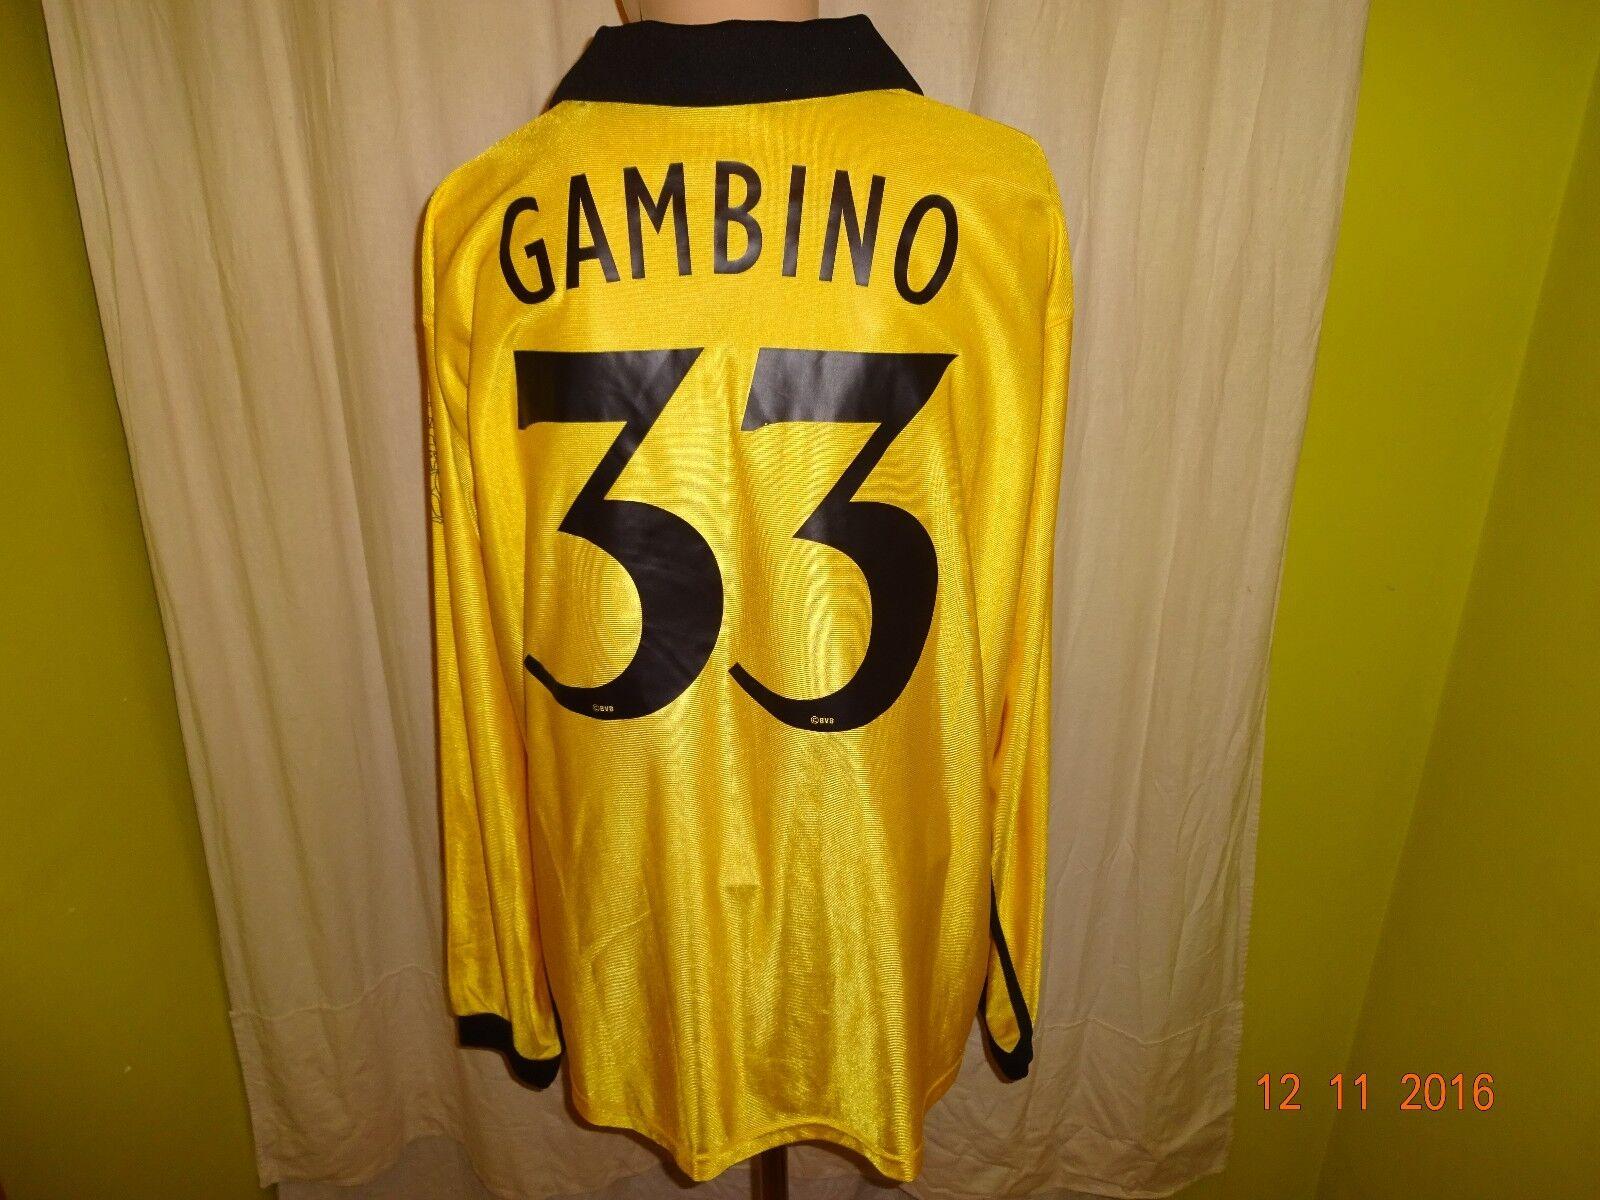 Borussia Dortmund Dortmund Borussia gool Langarm UEFA-CUP Trikot 2003/04 + Nr.33 Gambino Gr.XXL 40118d